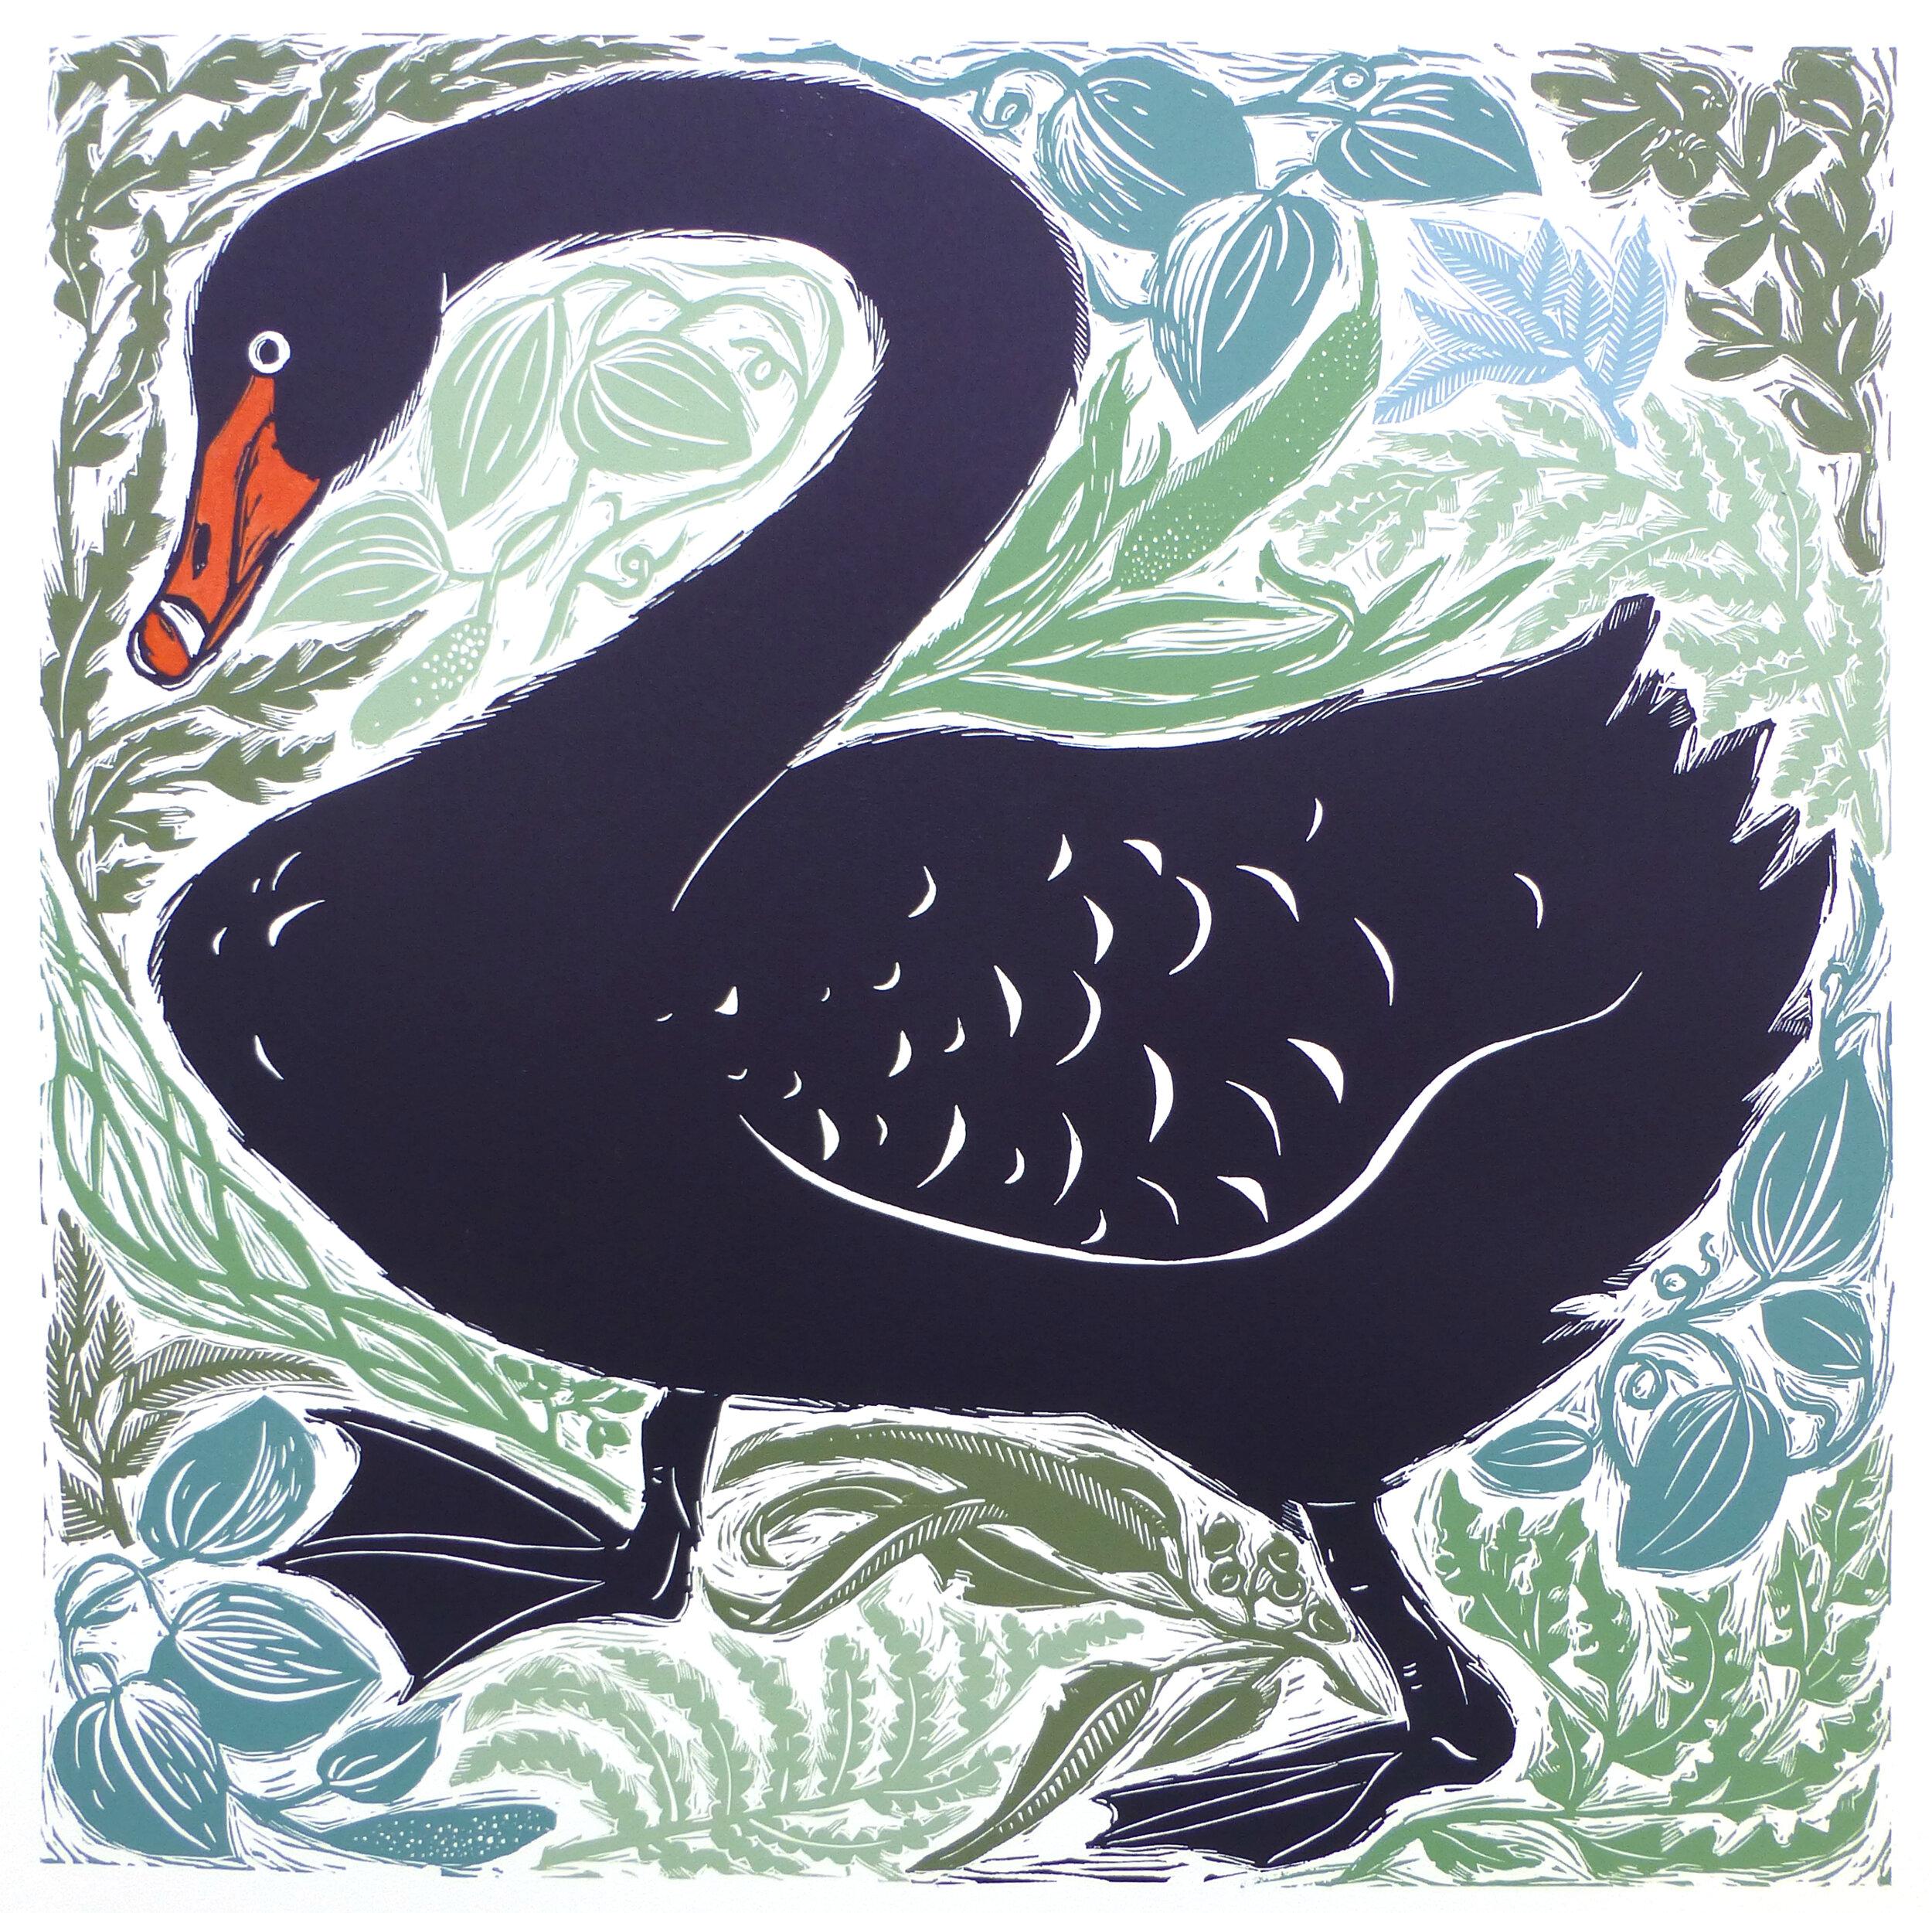 Black Swan Amongst Foliage.jpg